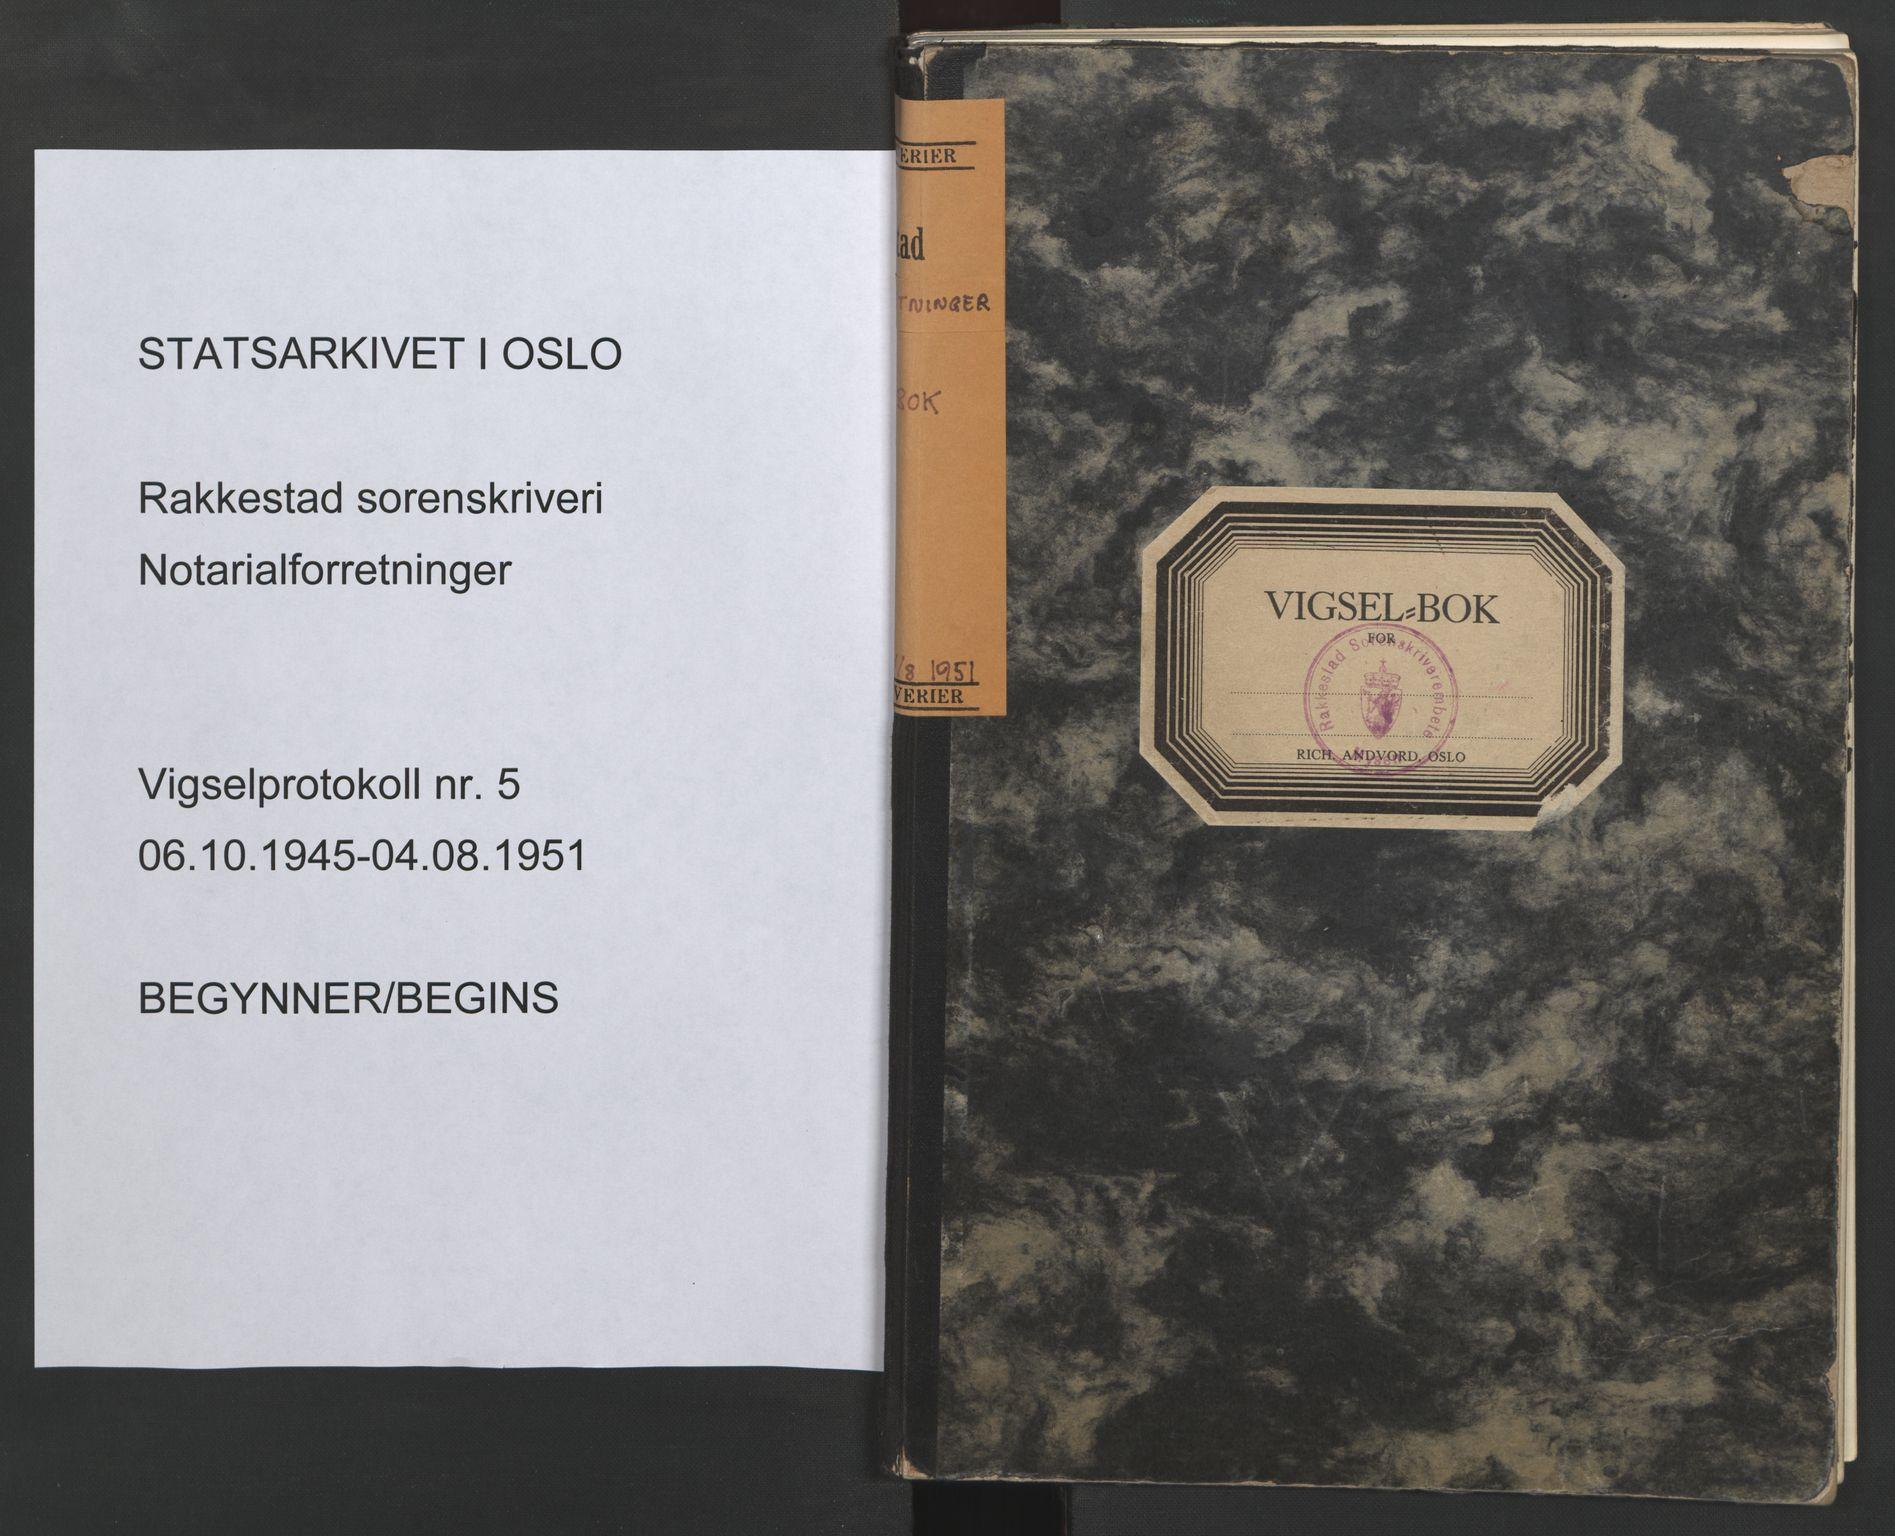 SAO, Rakkestad sorenskriveri, L/Lc/Lca/L0005: Vigselbøker, 1945-1951, s. upaginert